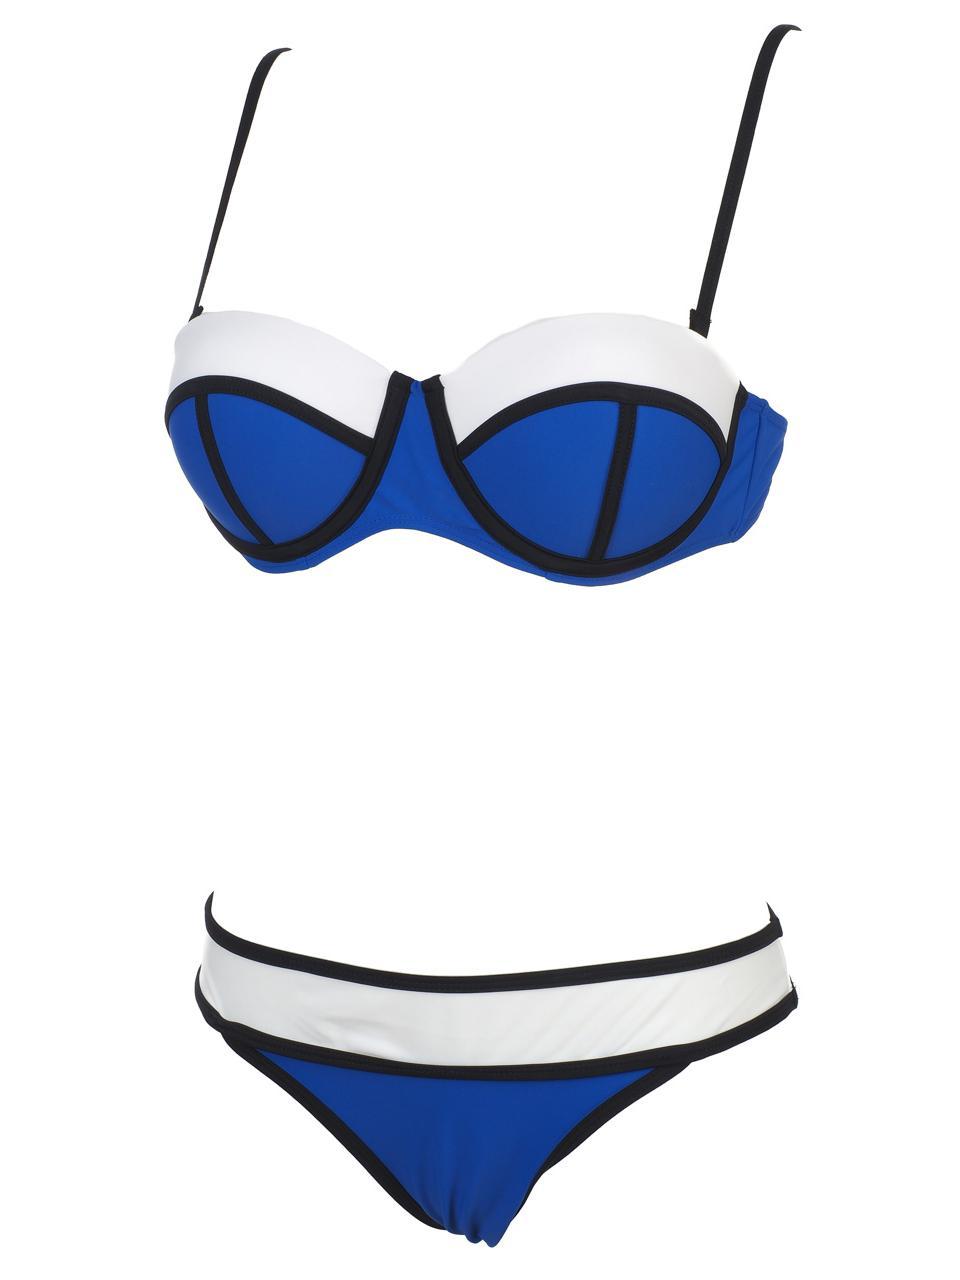 Maillot-de-bain-2-pieces-Culture-sud-Appa-royal-2p-Bleu-79870-Neuf miniature 4